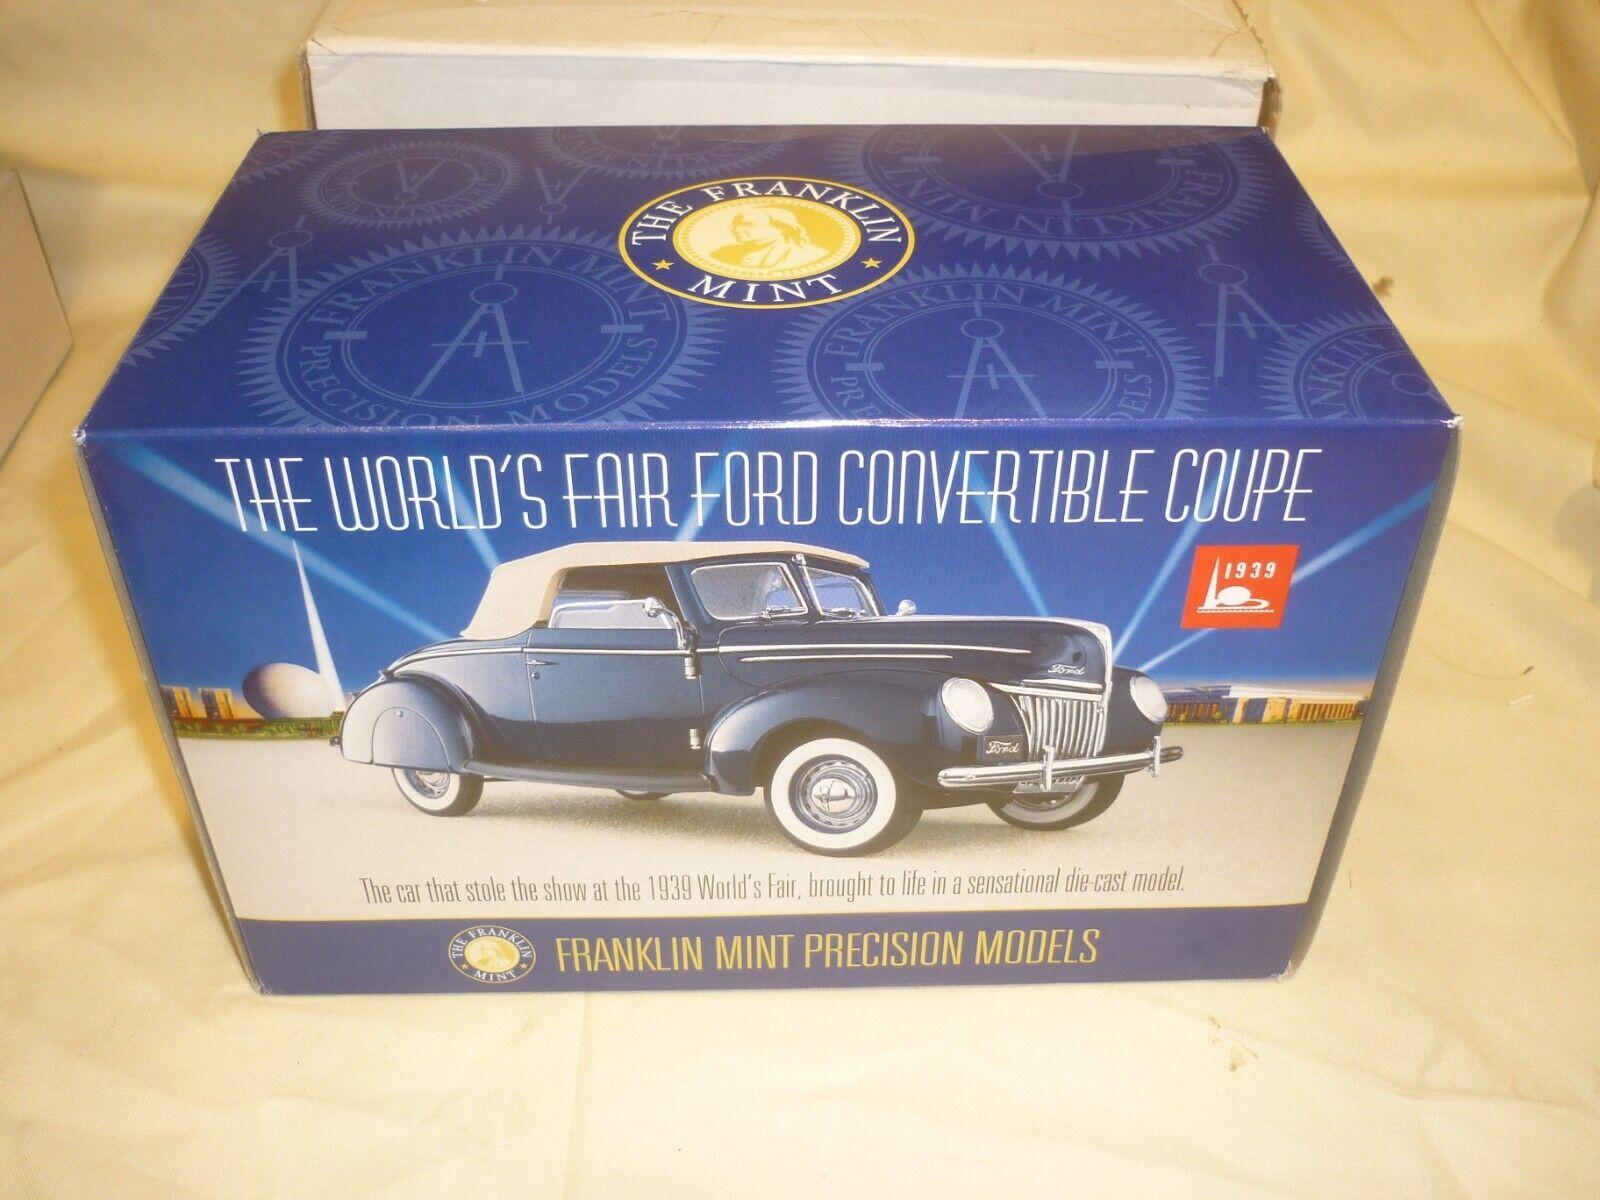 Une occasion FRANKLIN Comme neuf World's fair 1939 Ford Convertible,  Boxed, papiers,  livraison rapide